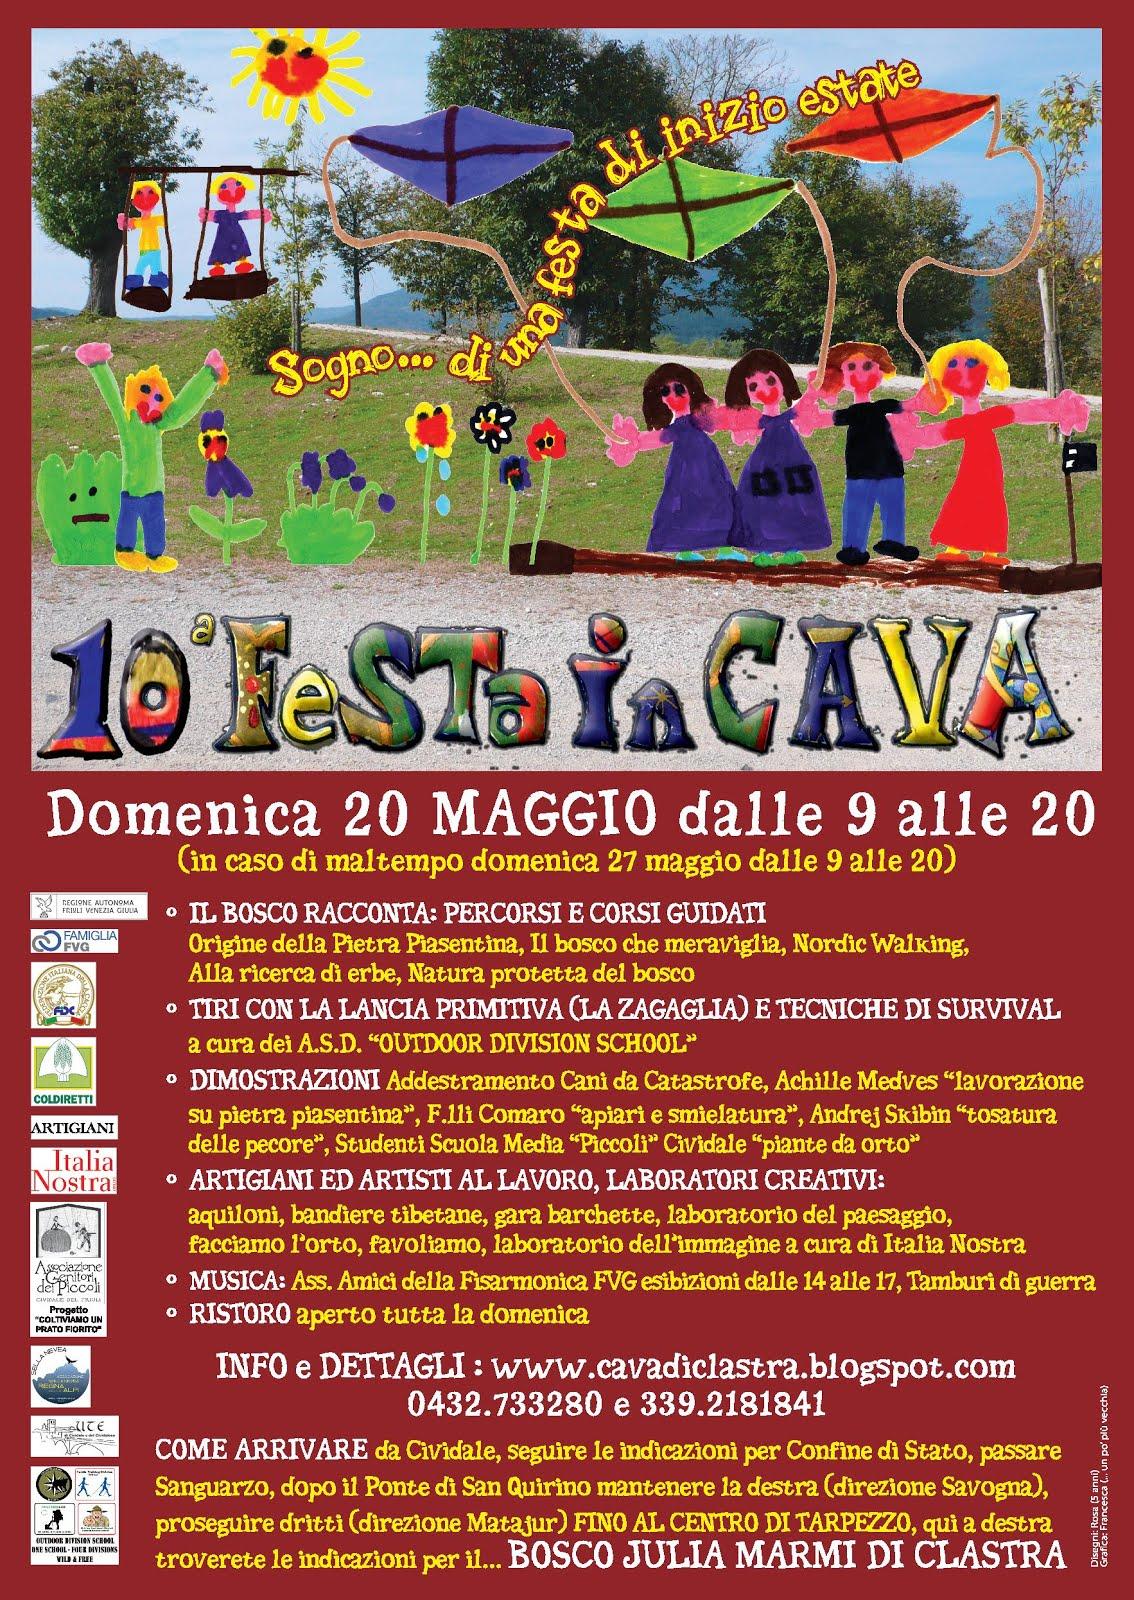 LOCANDINA FESTA IN CAVA 2018